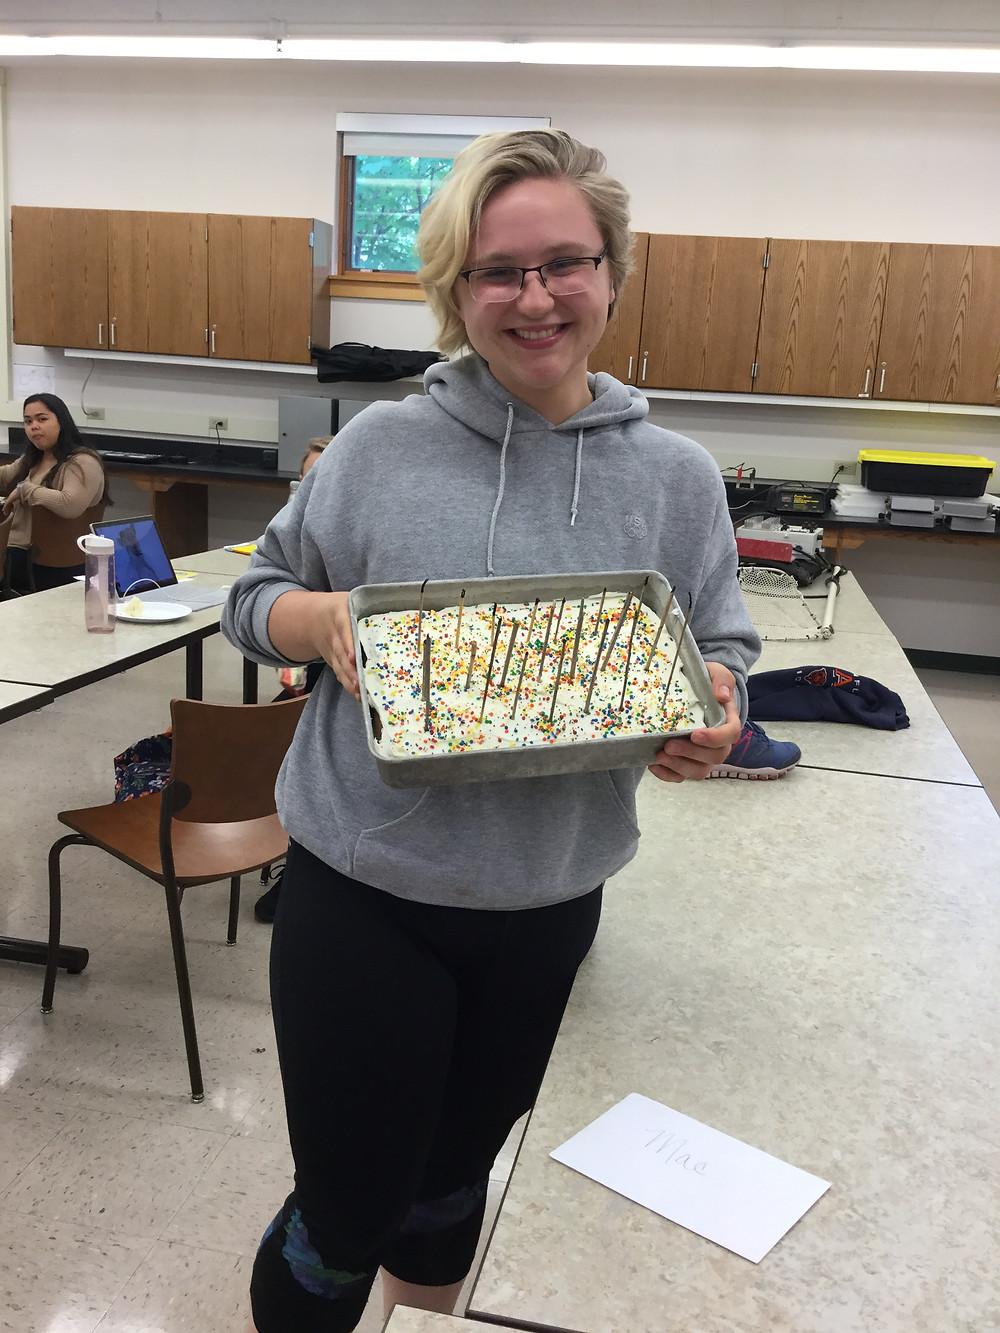 Mae with a funfetti cake